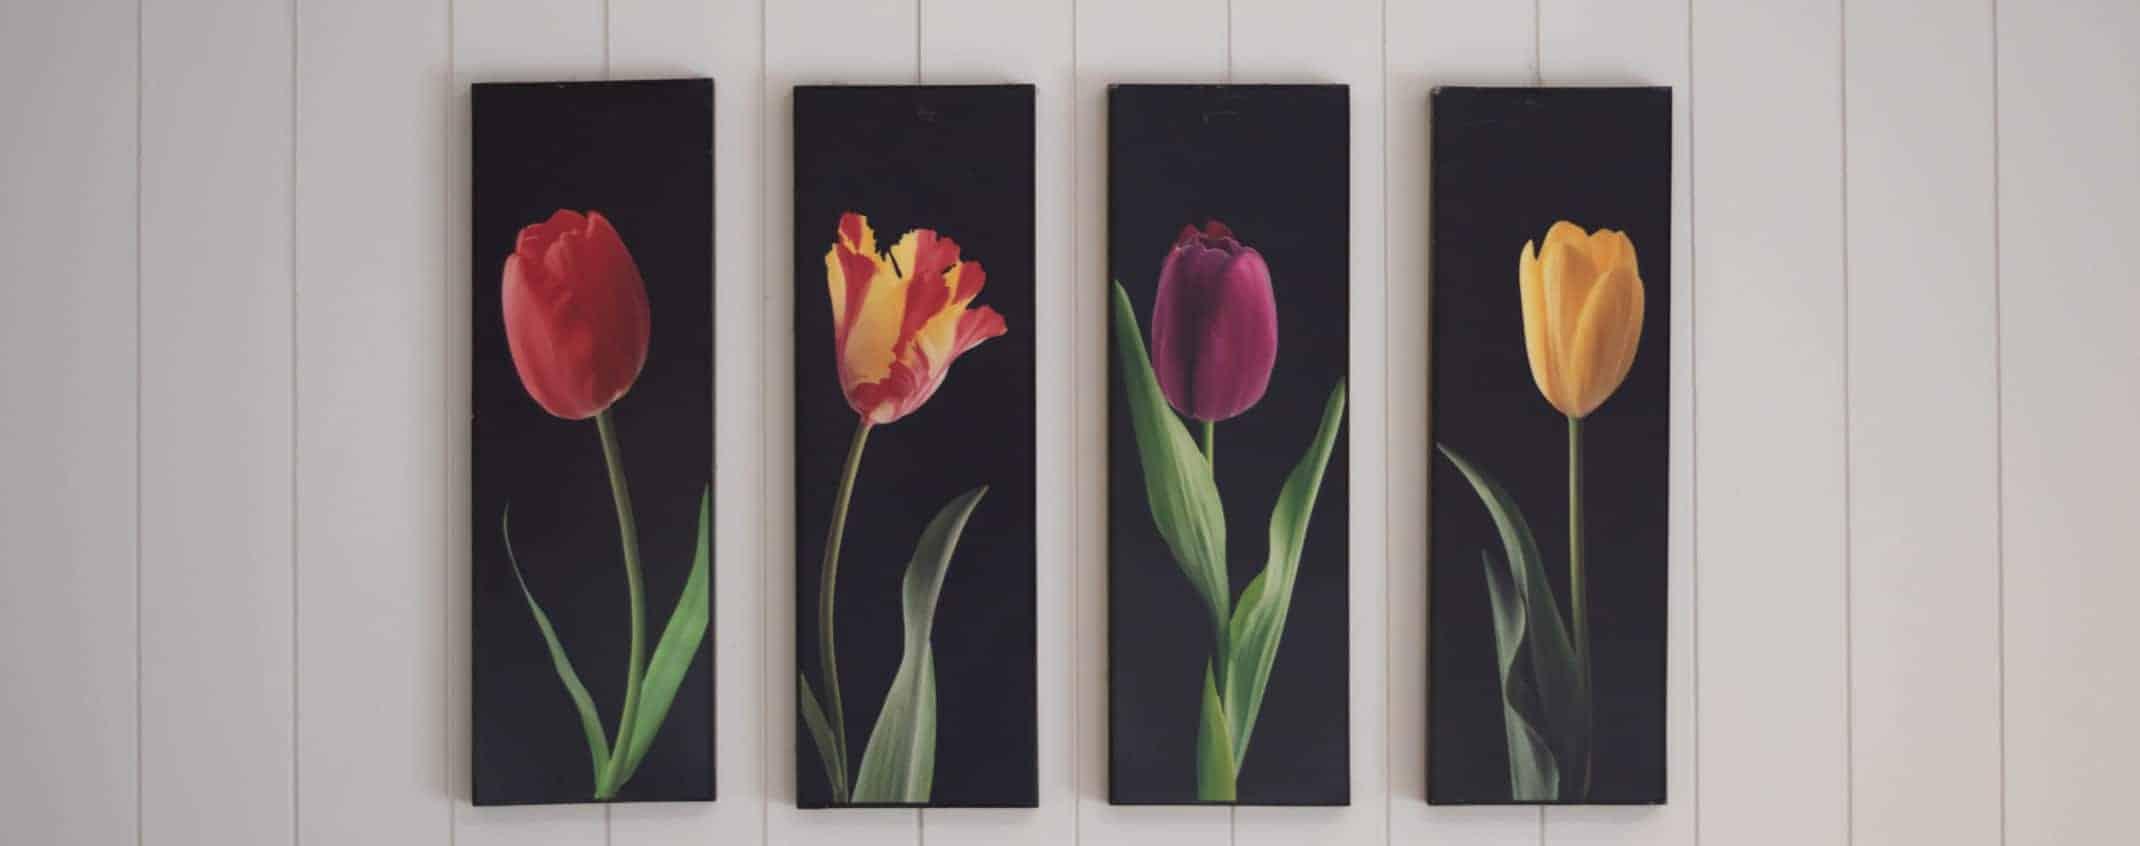 Canvas Prints (Comparing CanvasPop vs CanvasChamp)